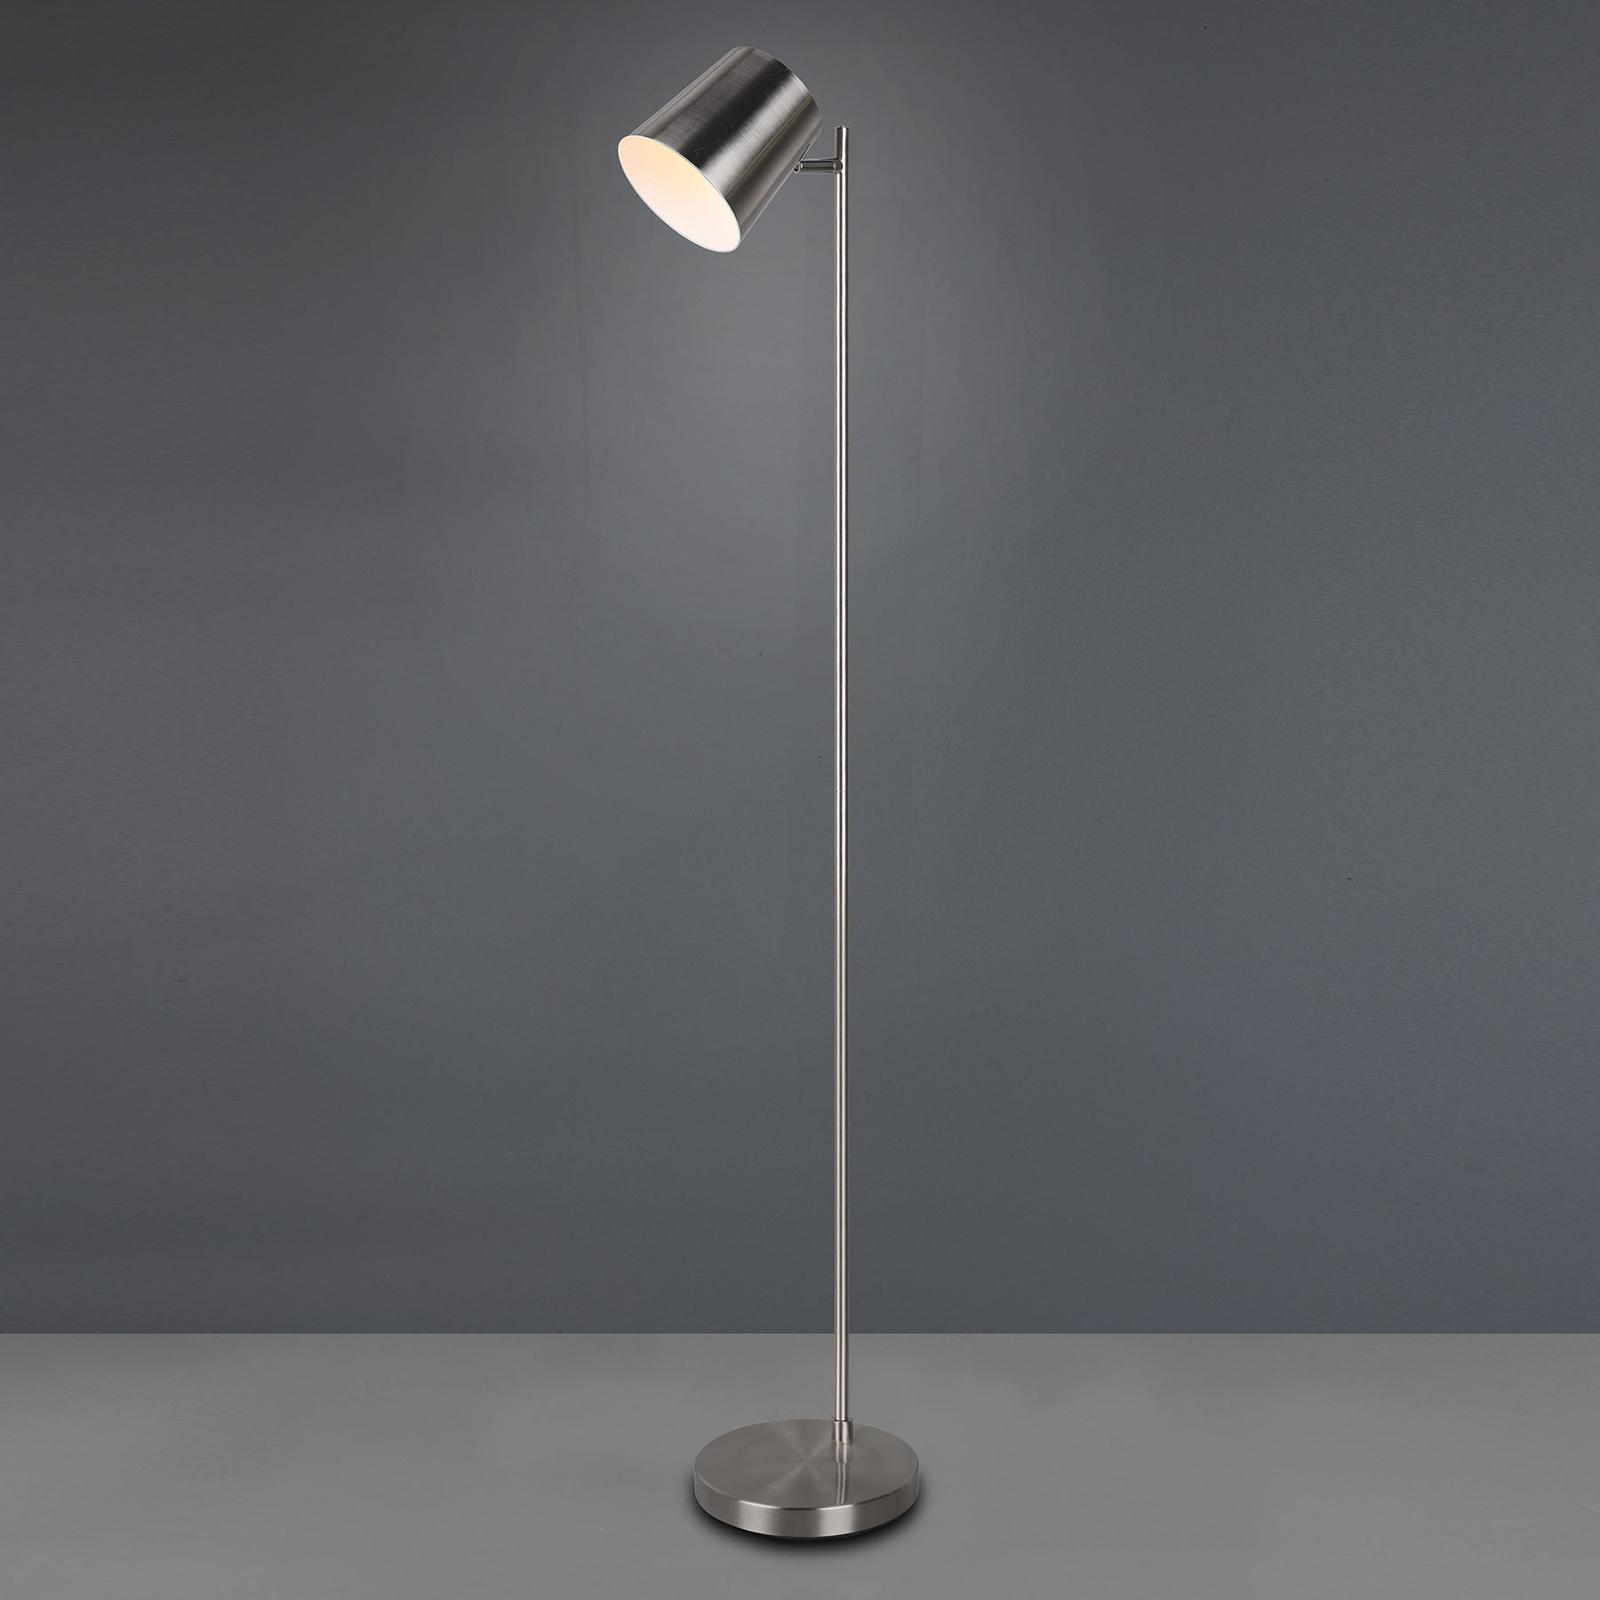 LED vloerlamp Blake met accu, dimbaar, nikkel